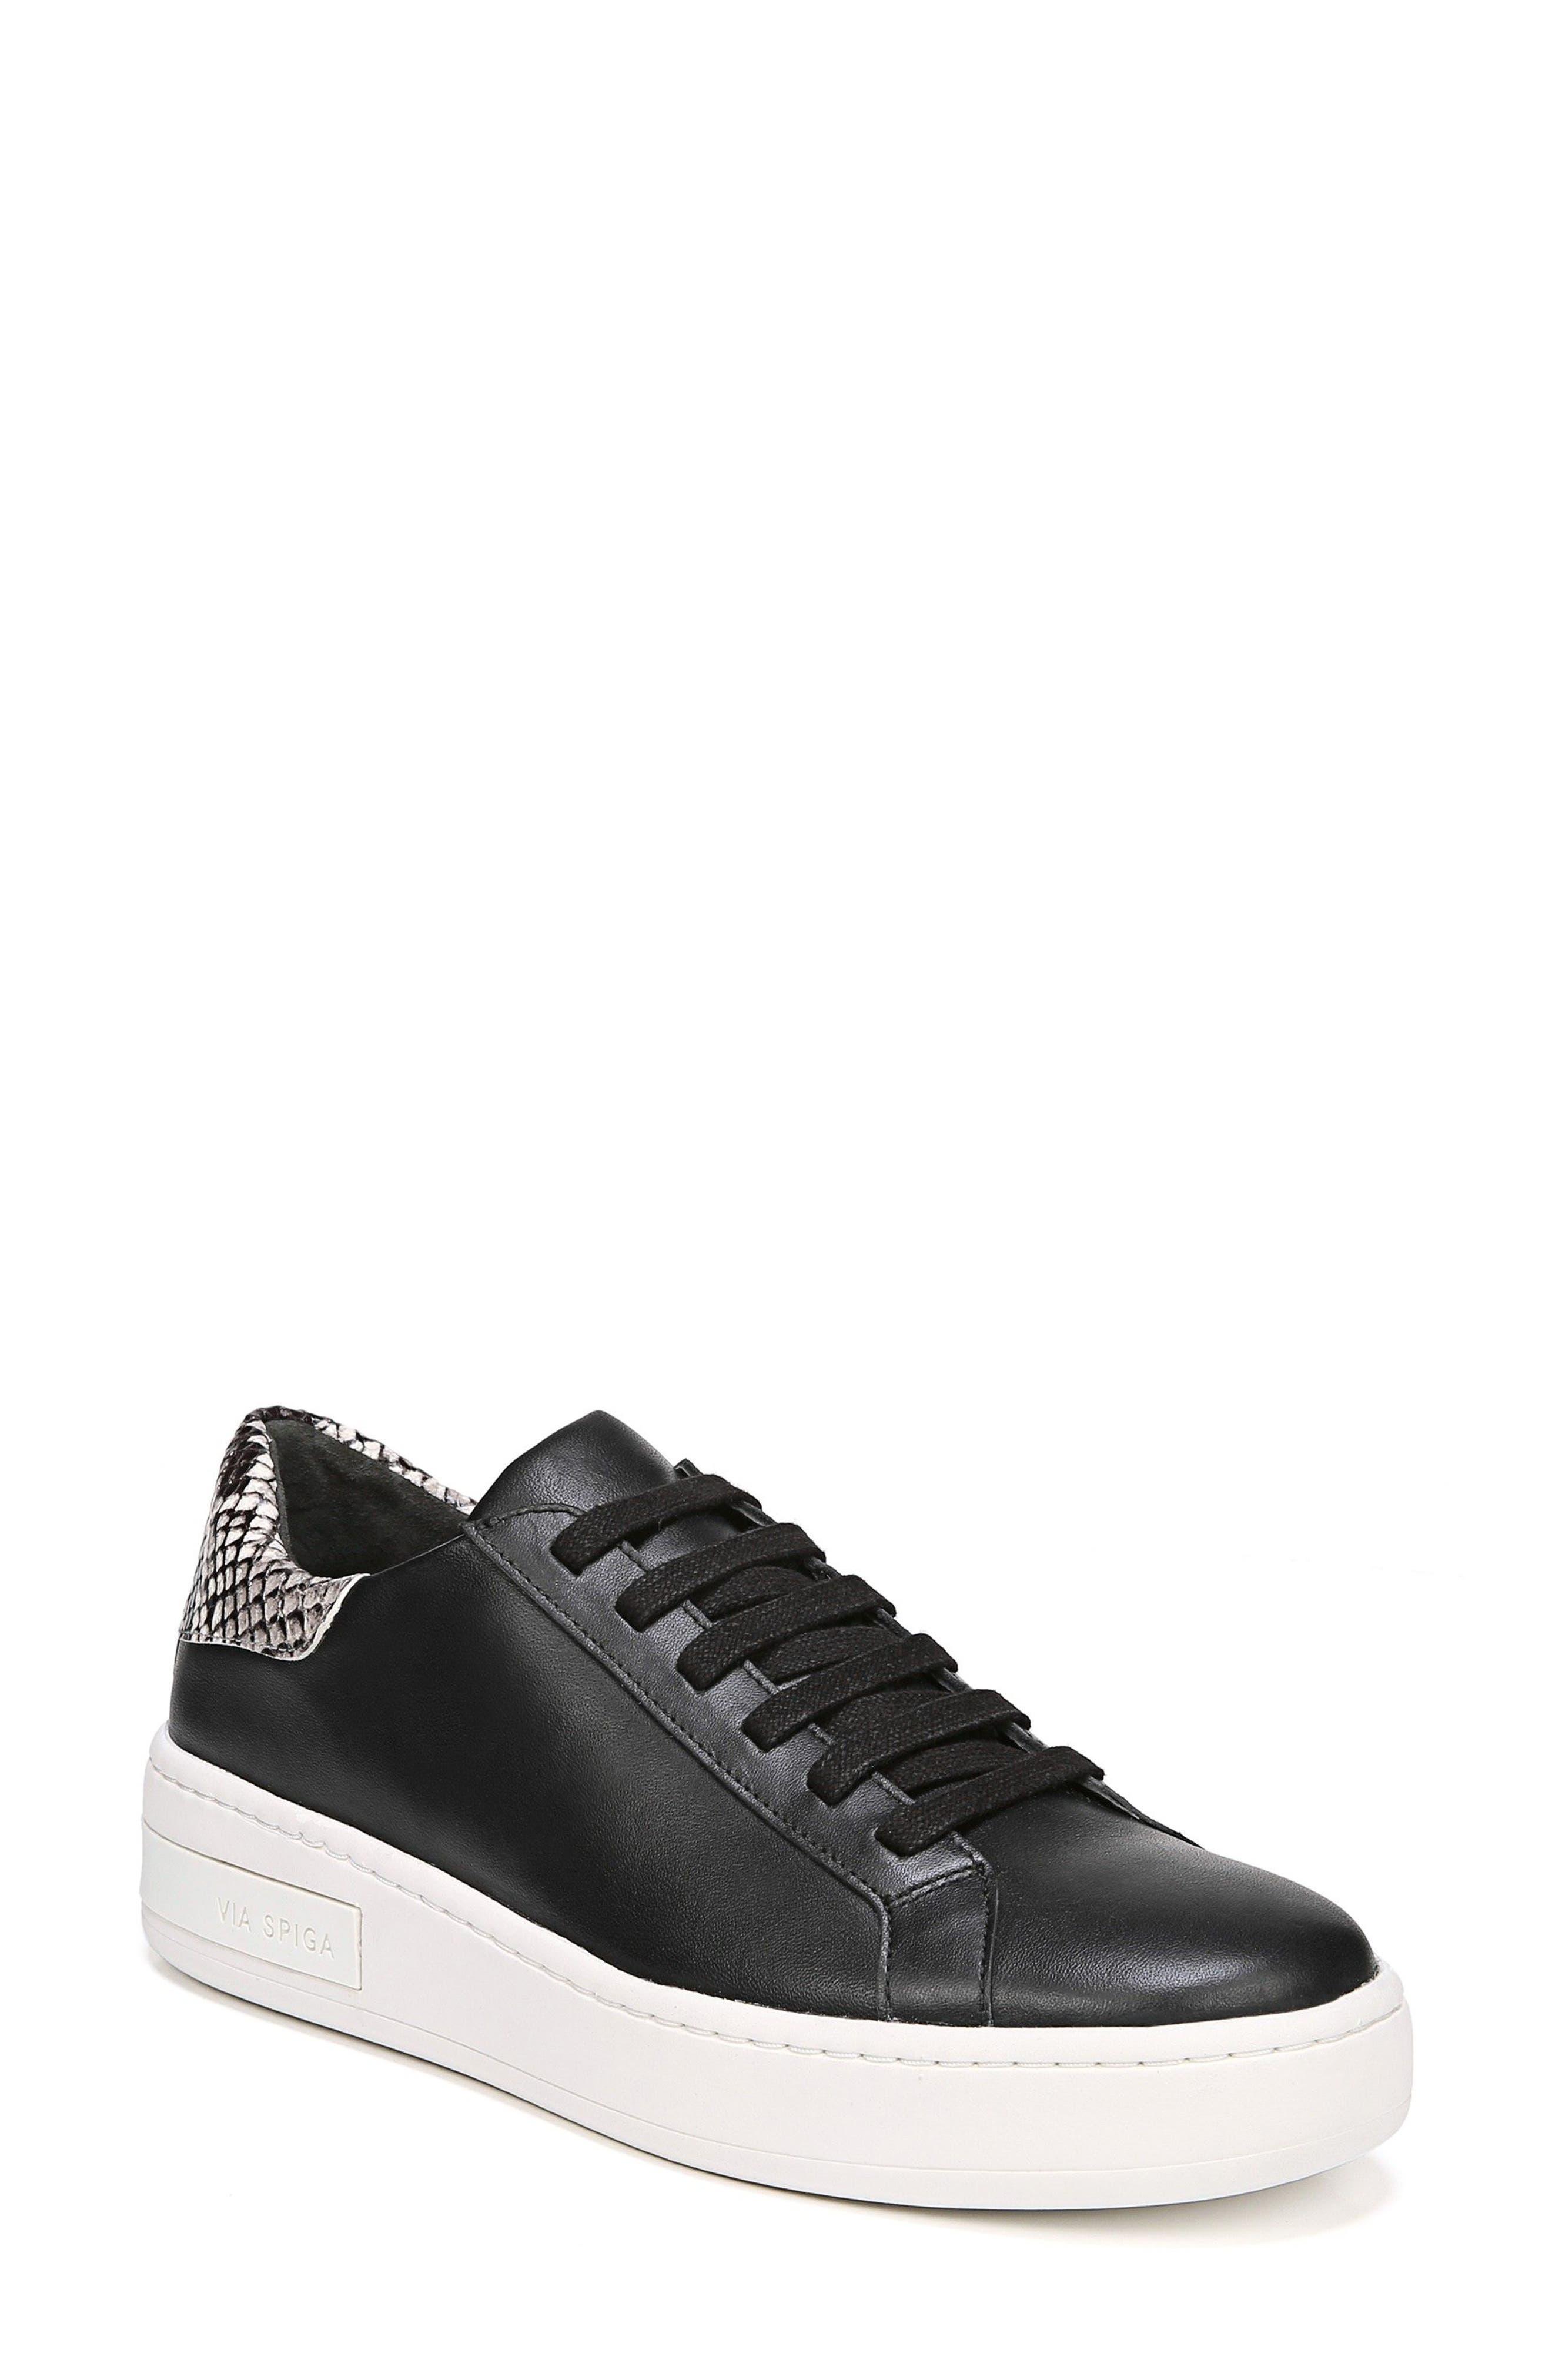 Rylen Platform Sneaker,                         Main,                         color, BLACK/ BLACK/ WHITE LEATHER